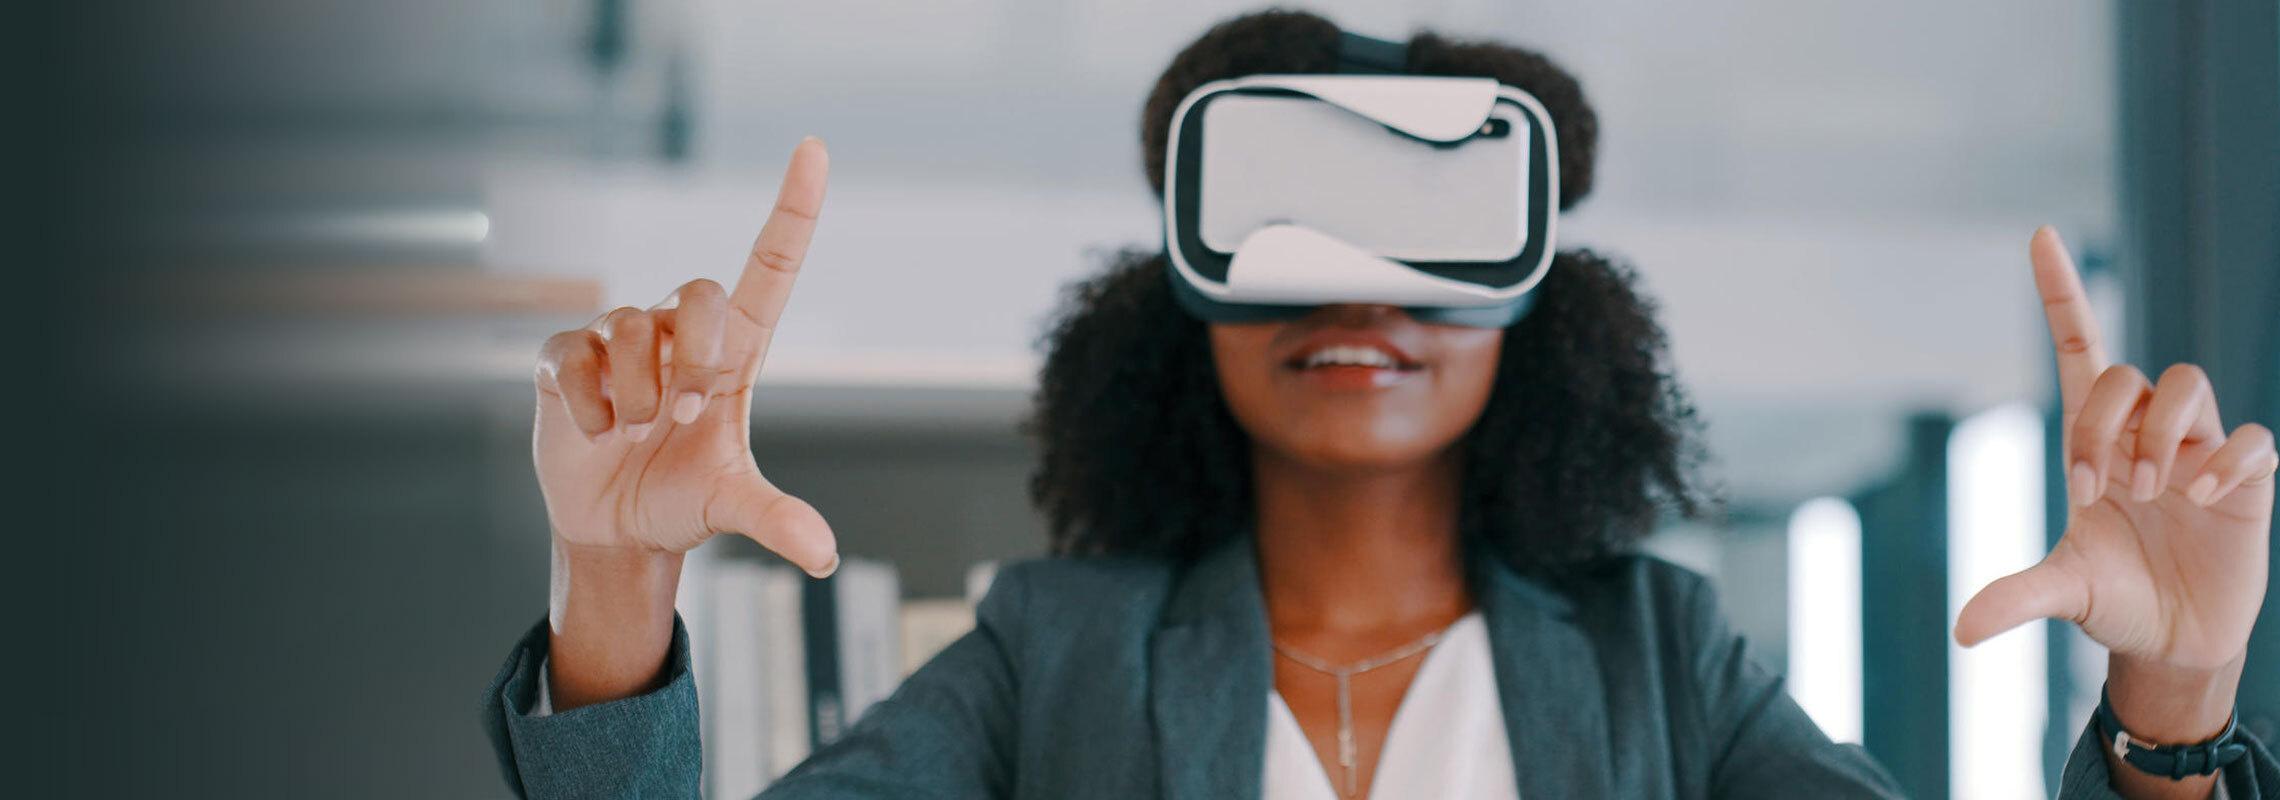 Woman wearing virtual reality (VR) headset